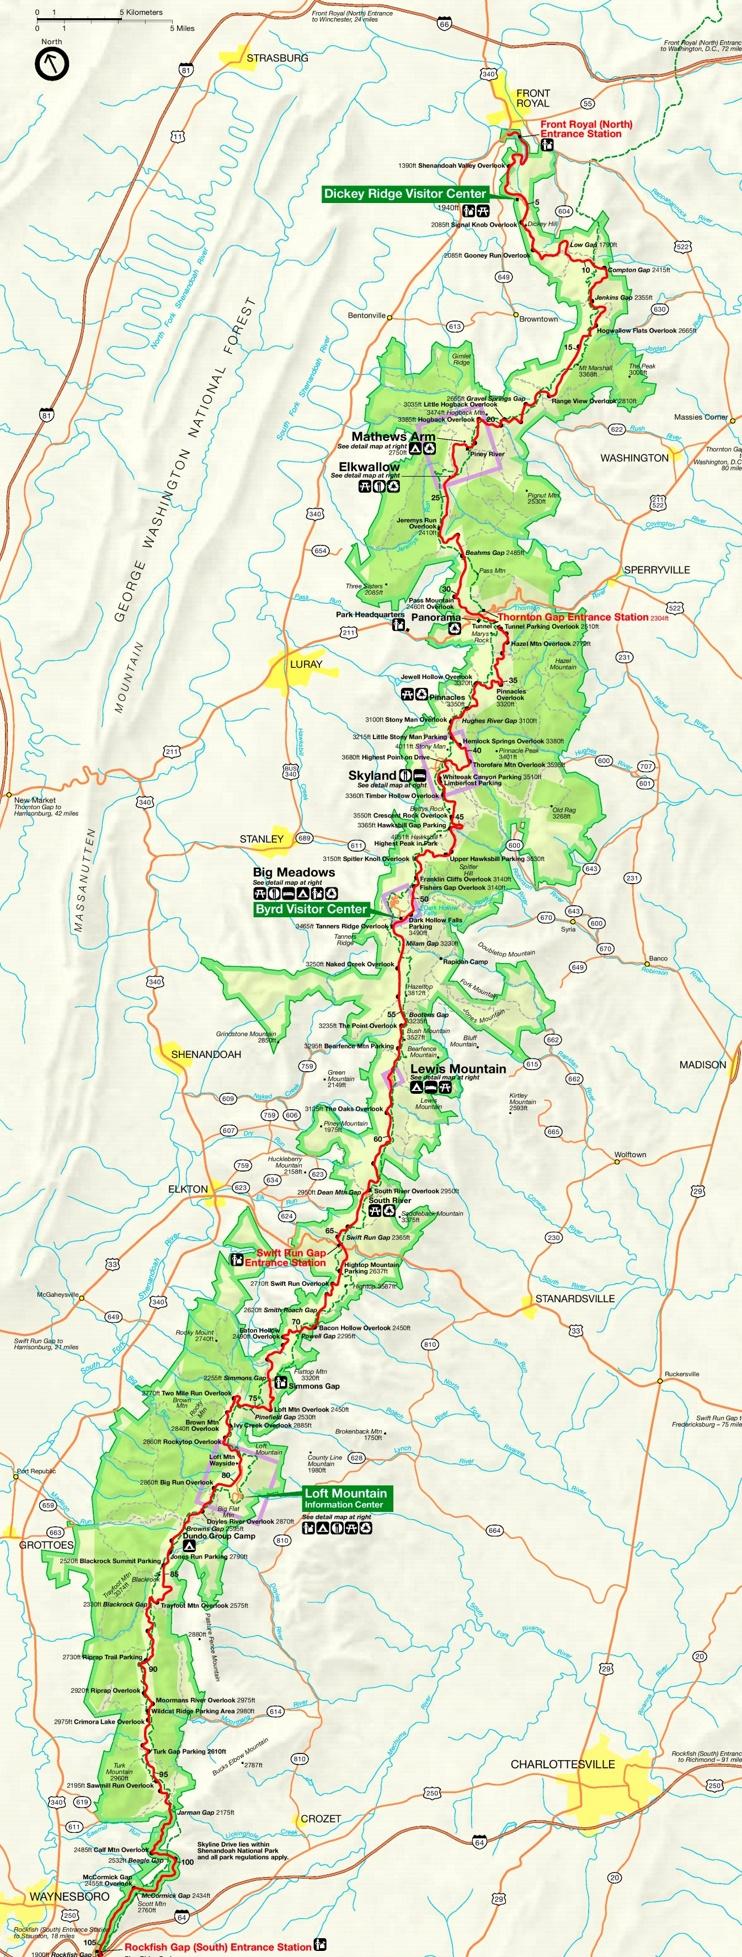 Shenandoah National Park tourist map